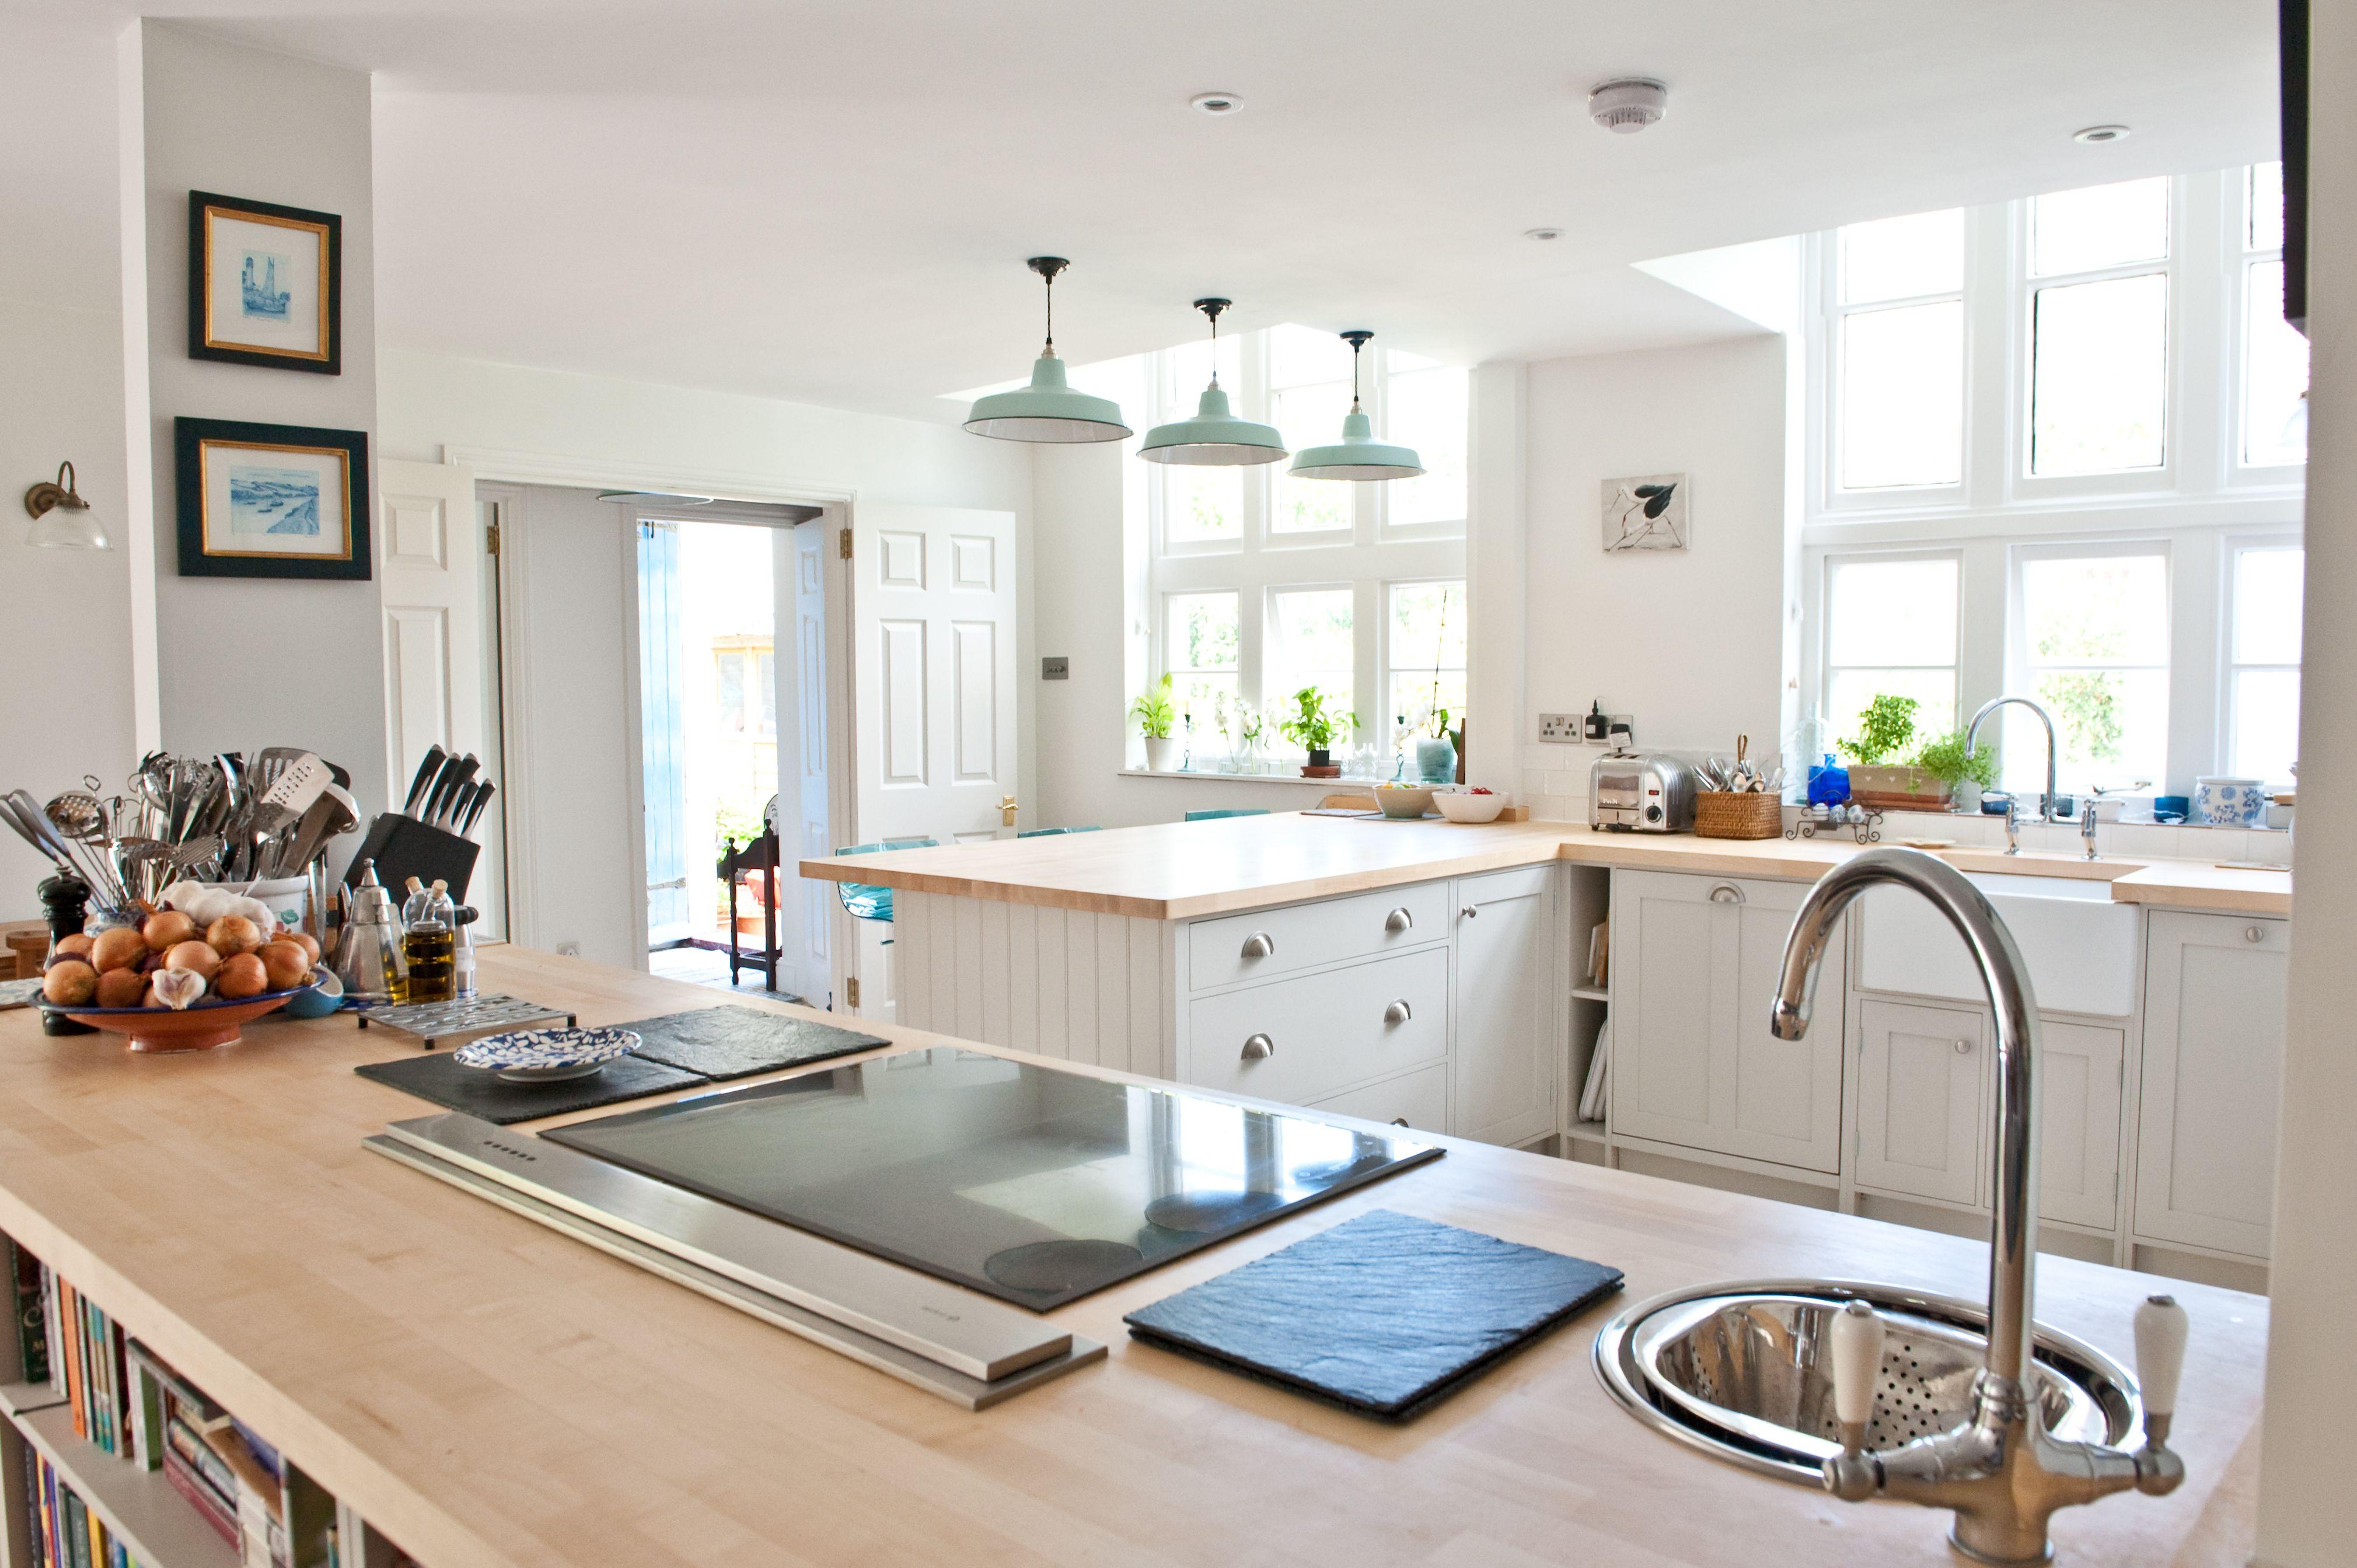 Pineland kitchens - beautiful units and worktops | kitchen ideas ...